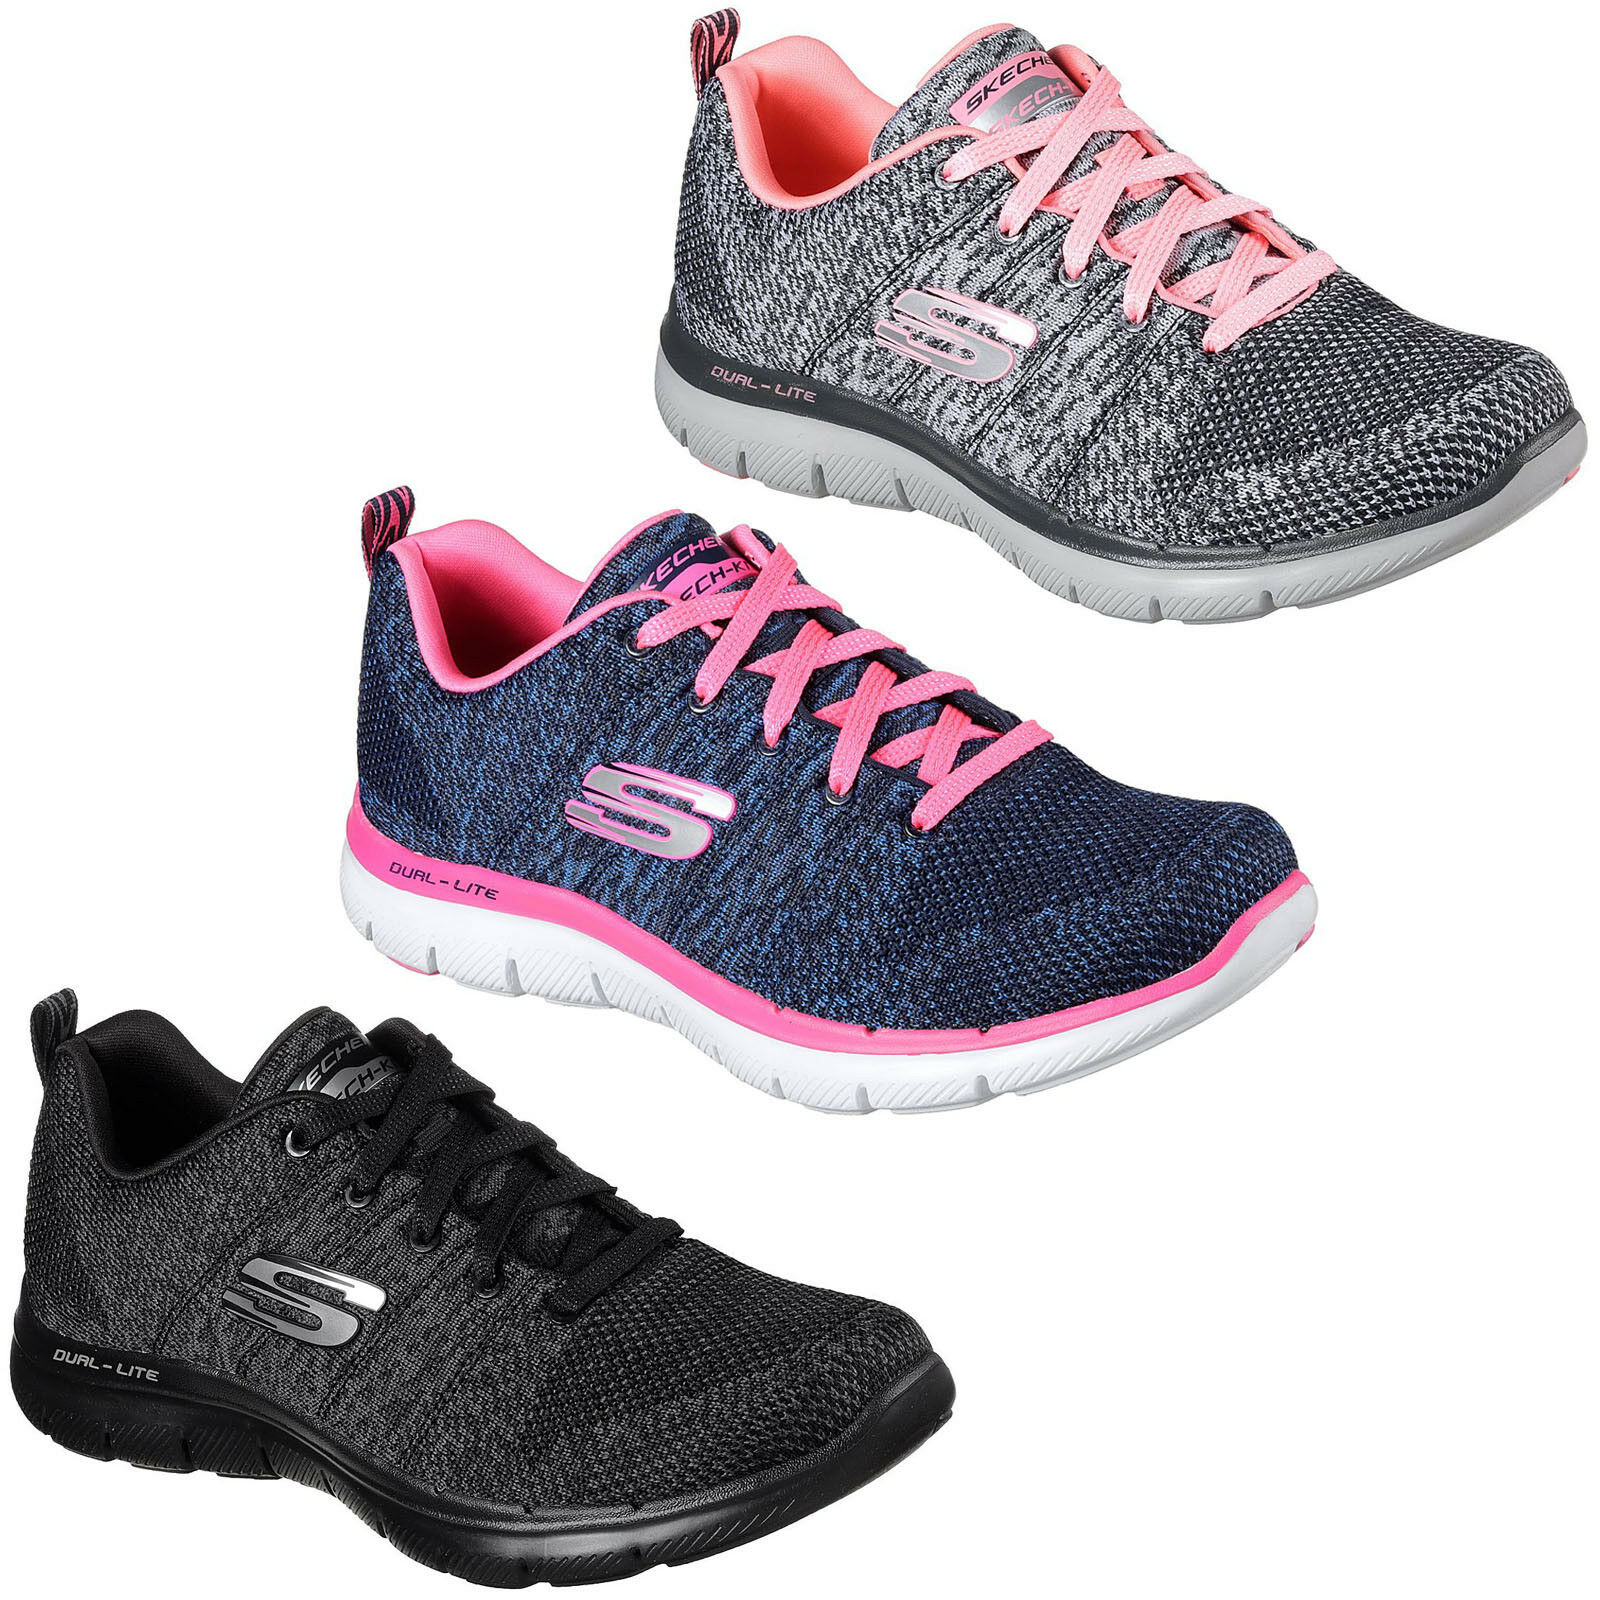 Skechers Flex Appeal 2.0 High Energy Trainers Damenschuhe Sports Memory Foam Schuhes